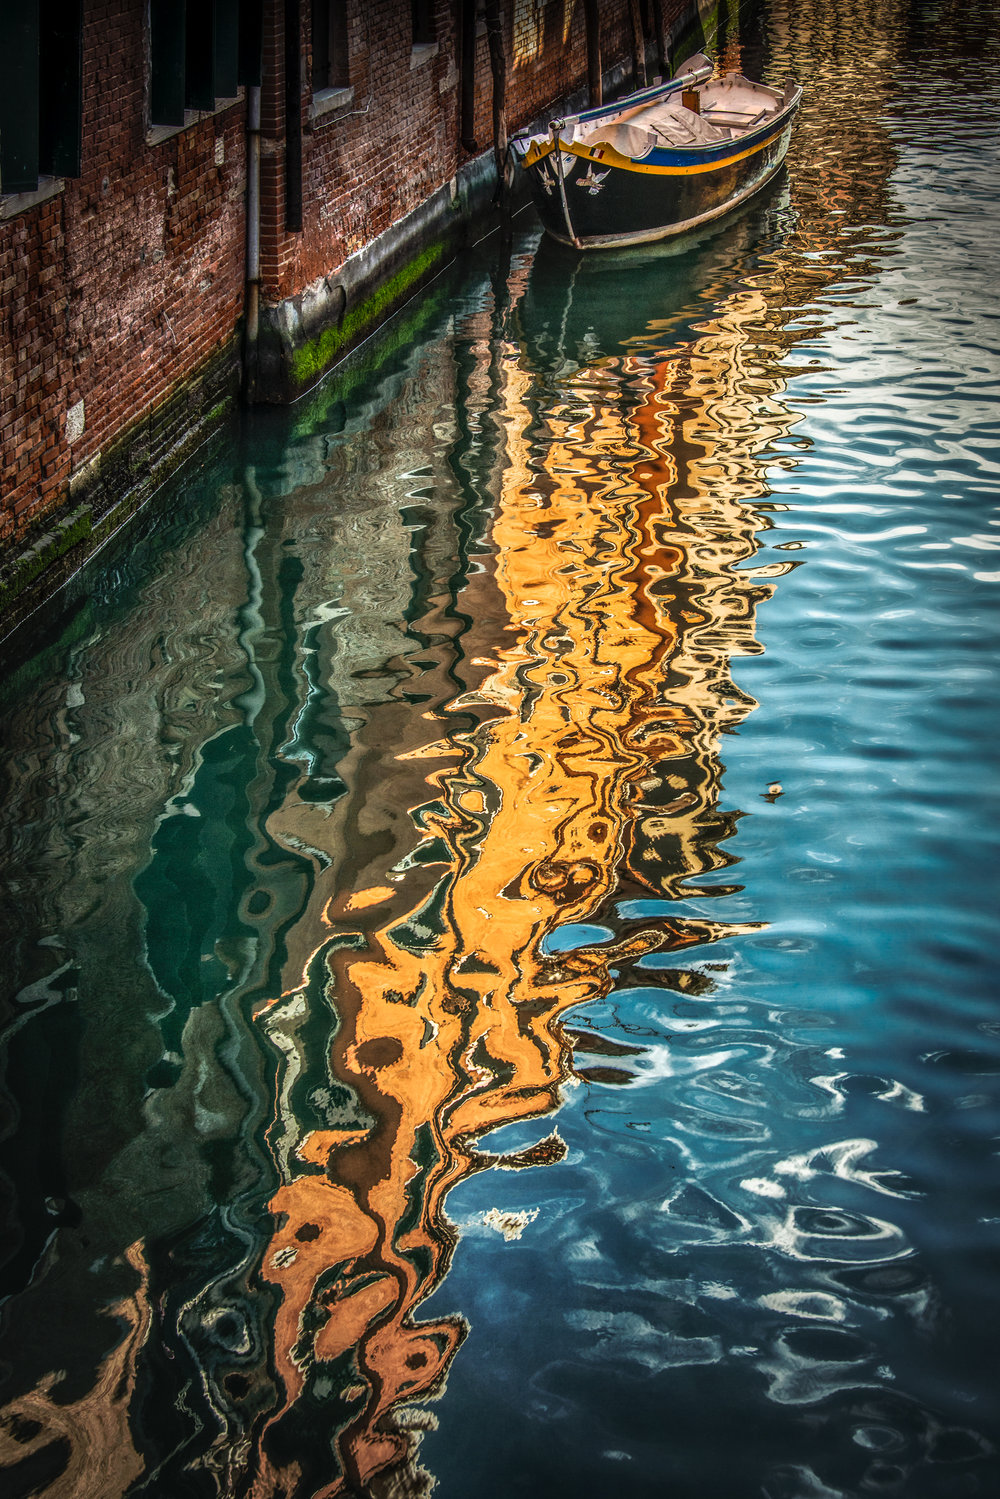 08-Reflections-4.jpg